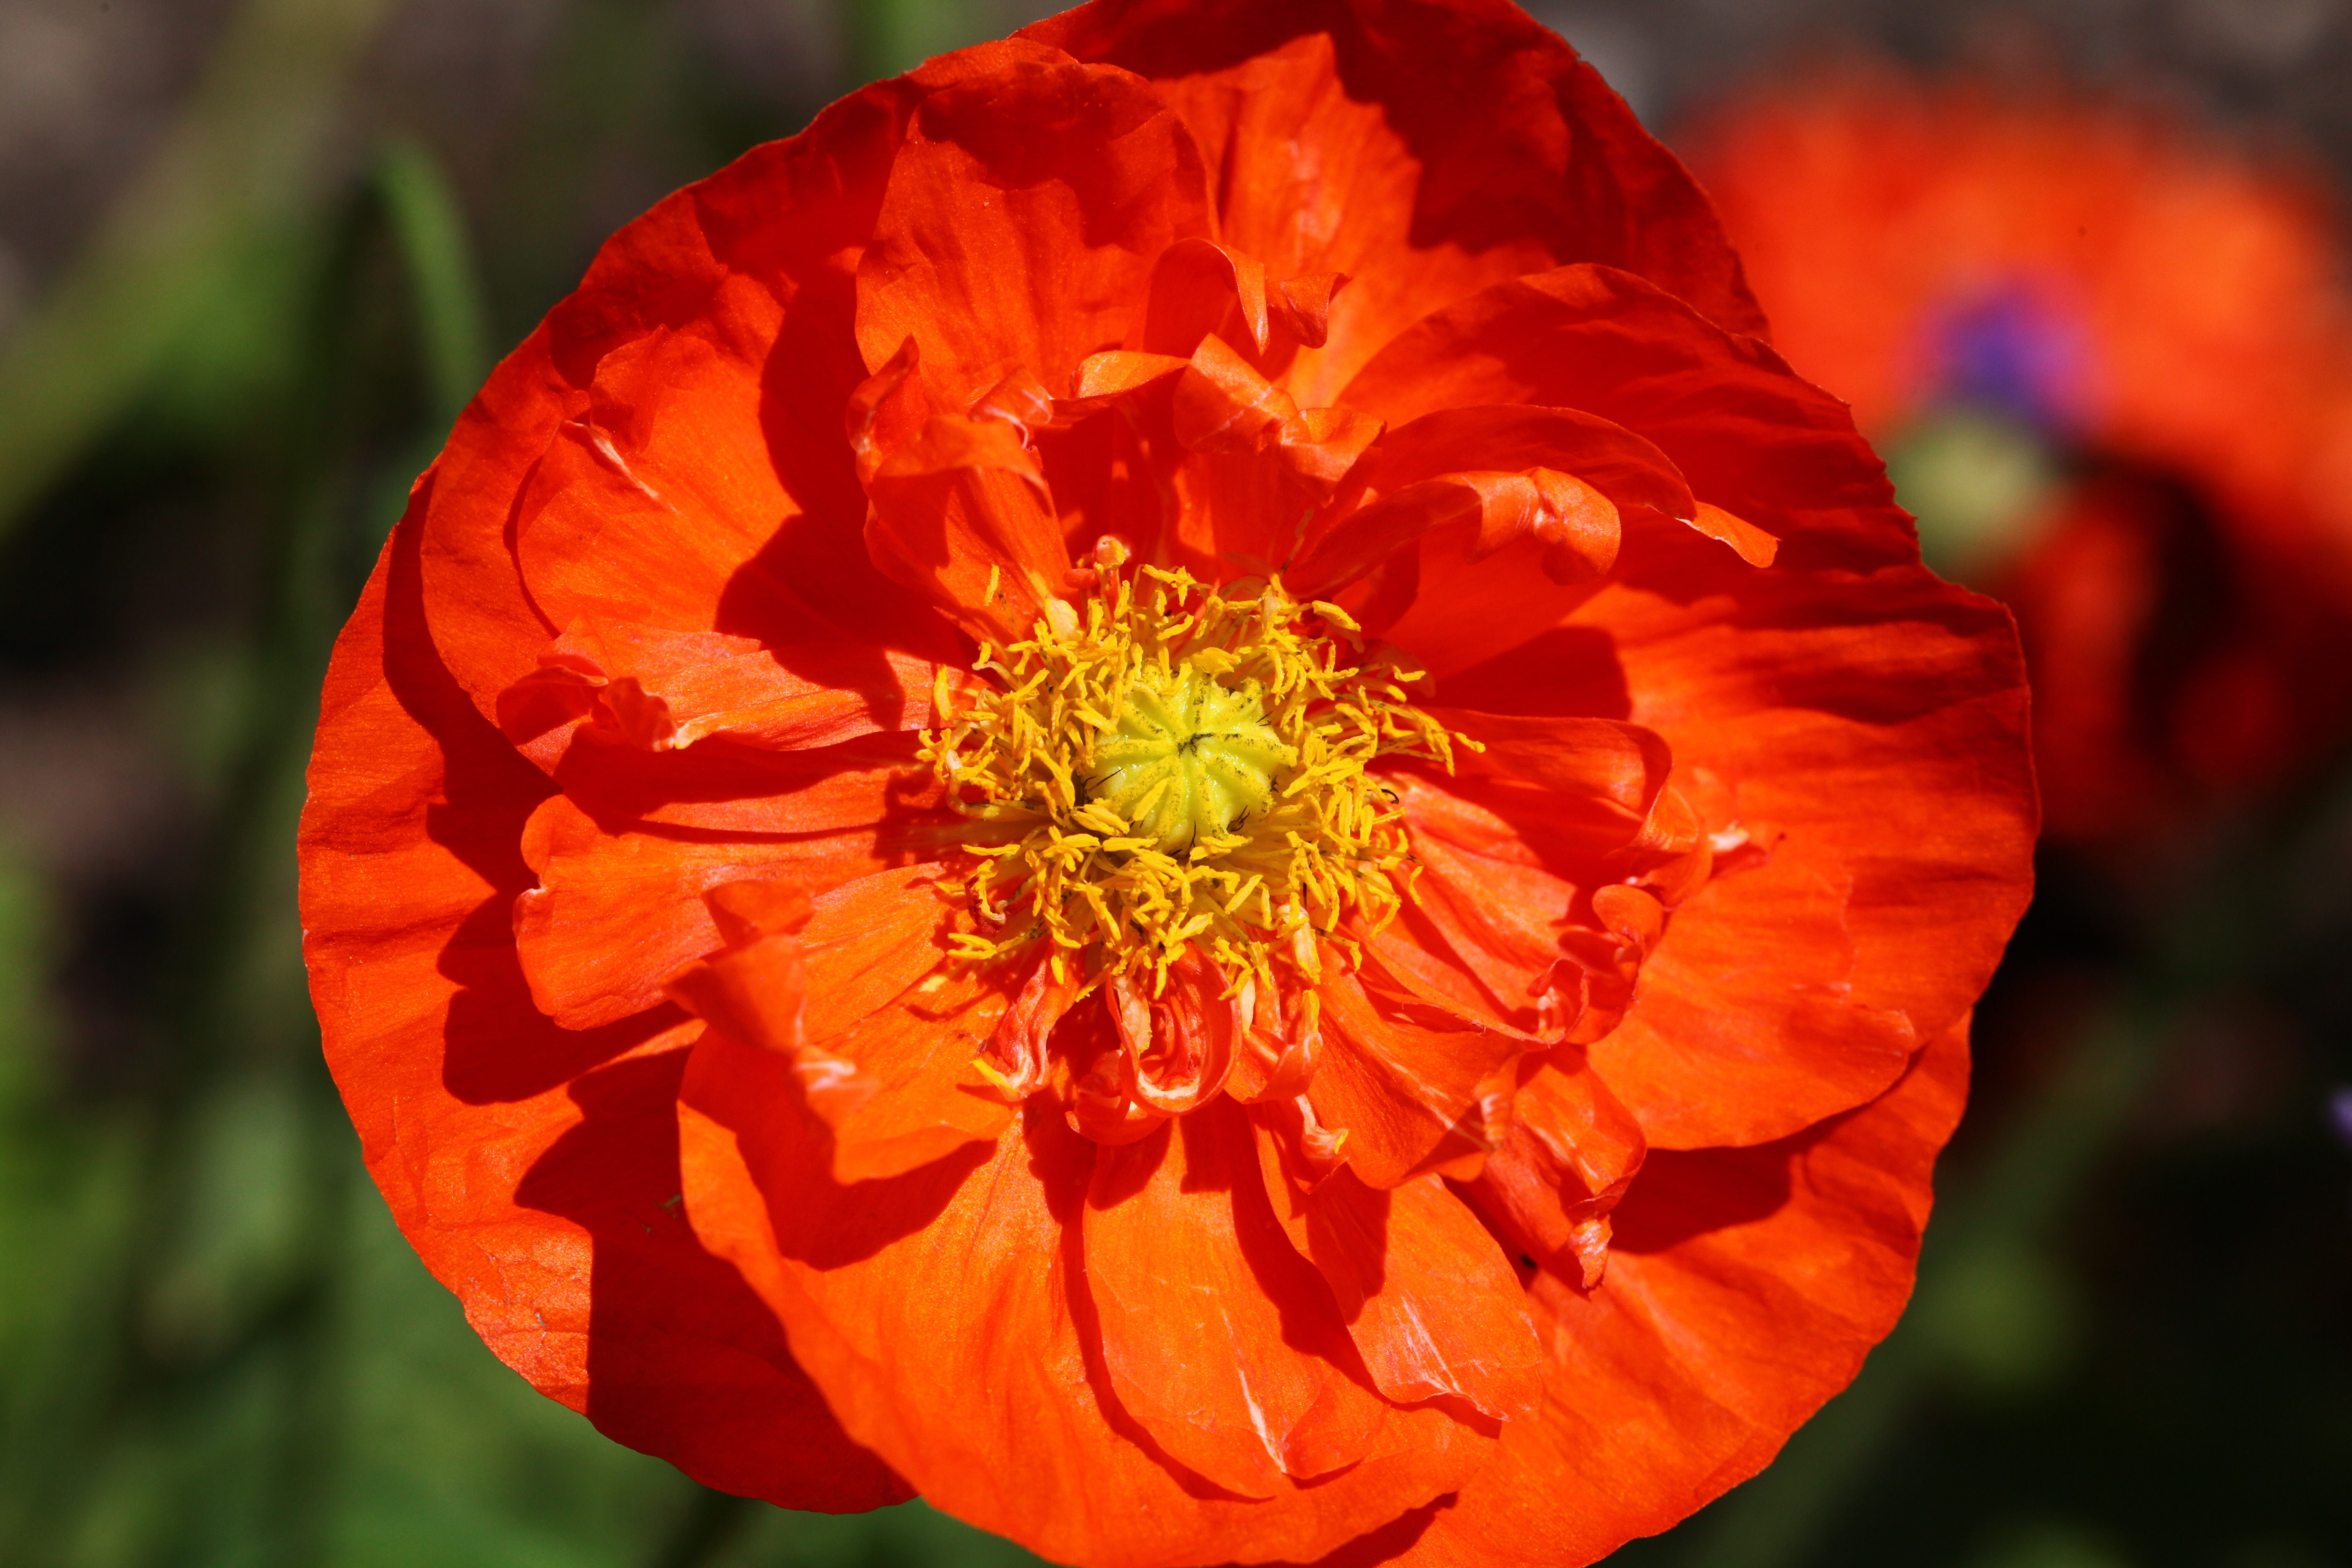 orange flower with yellow petals free stock photo